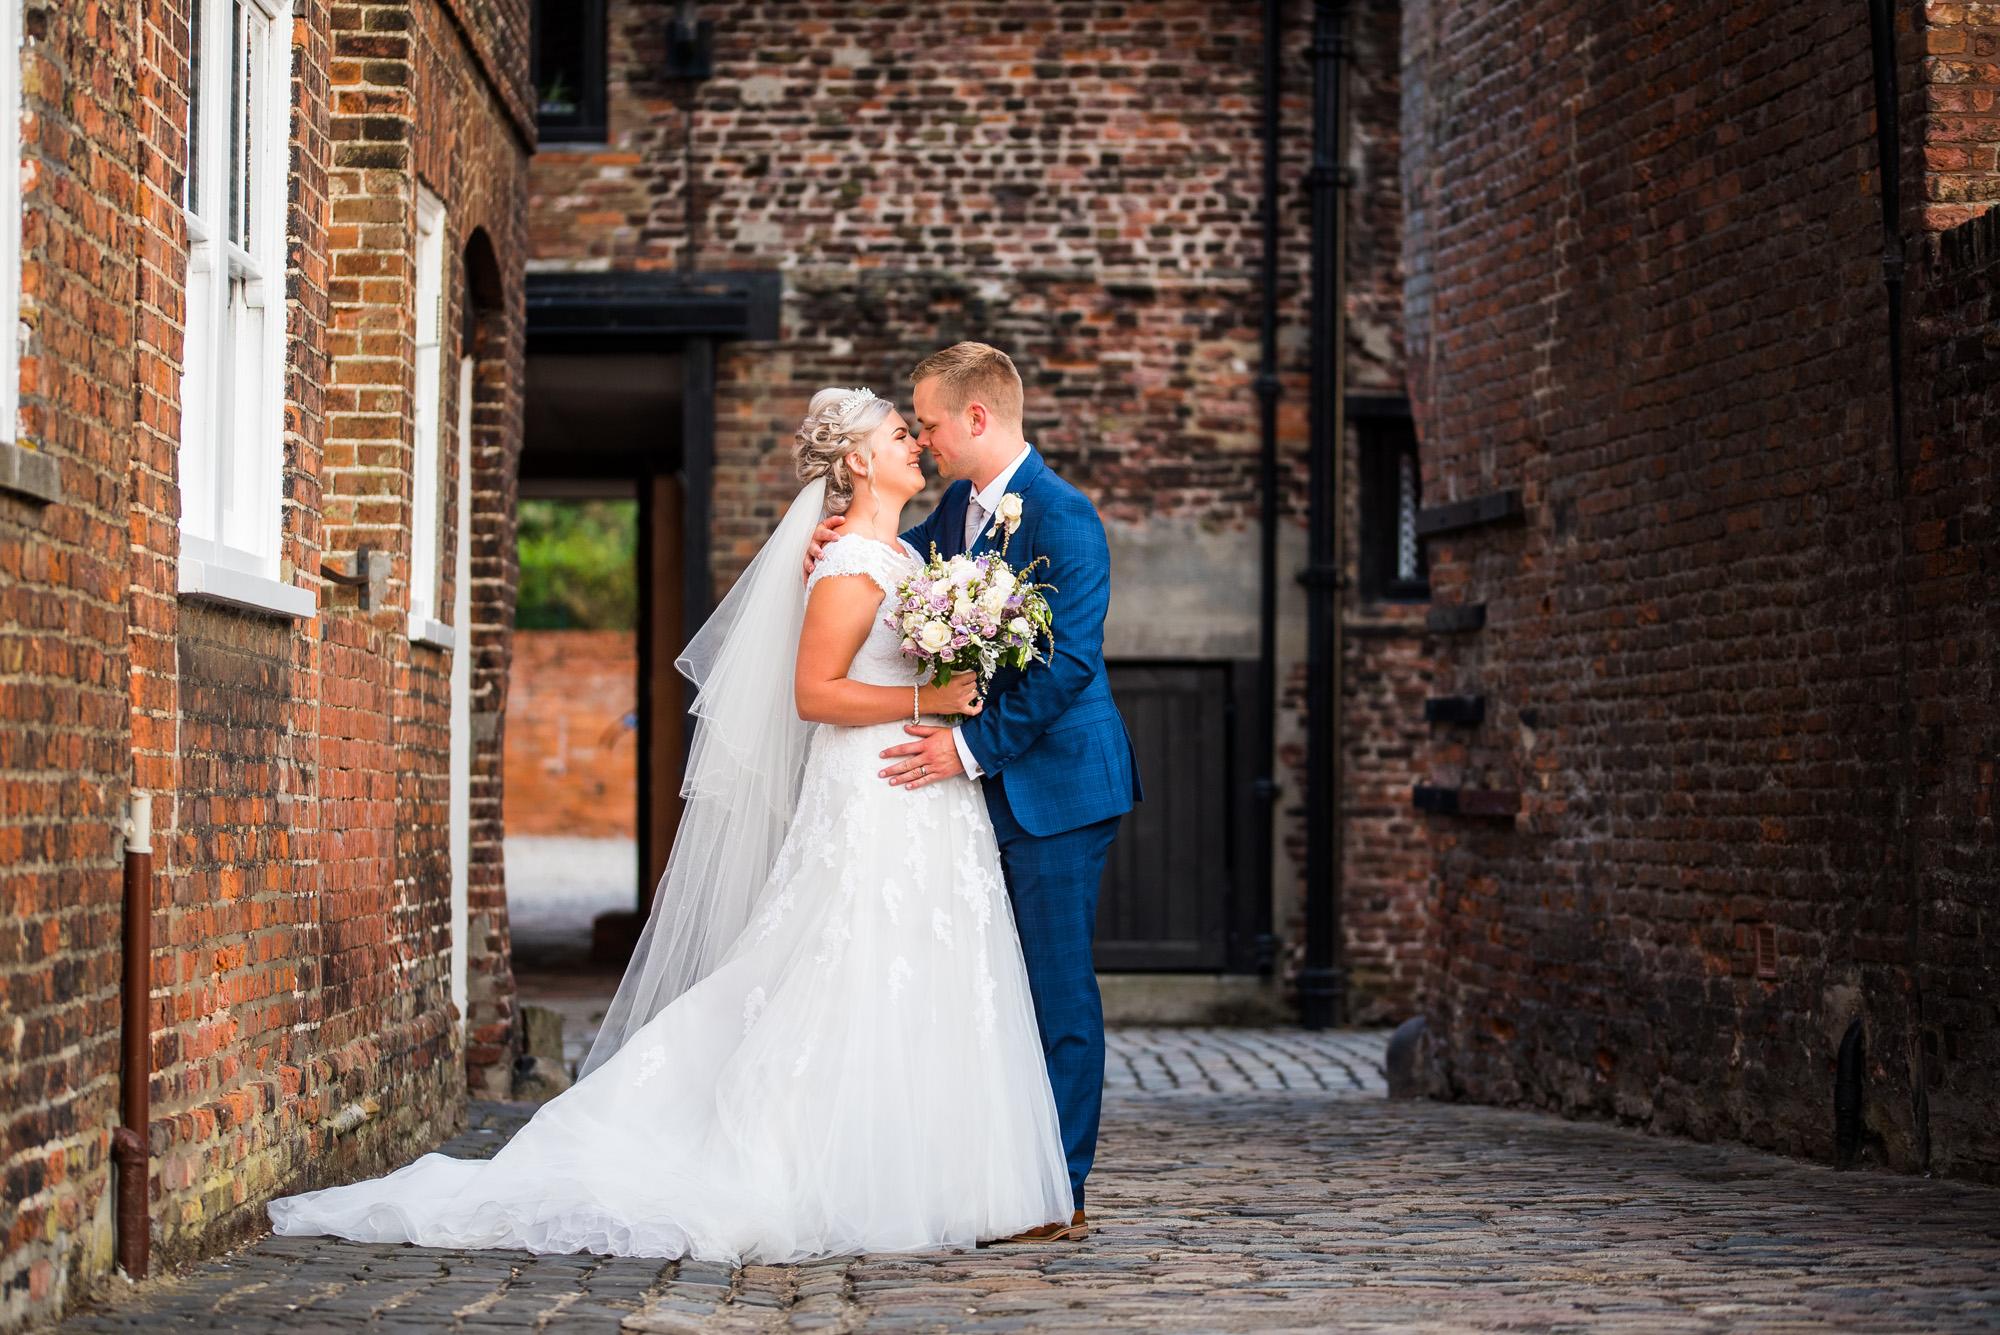 Savannah and Josh wedding photos (303 of 350).jpg